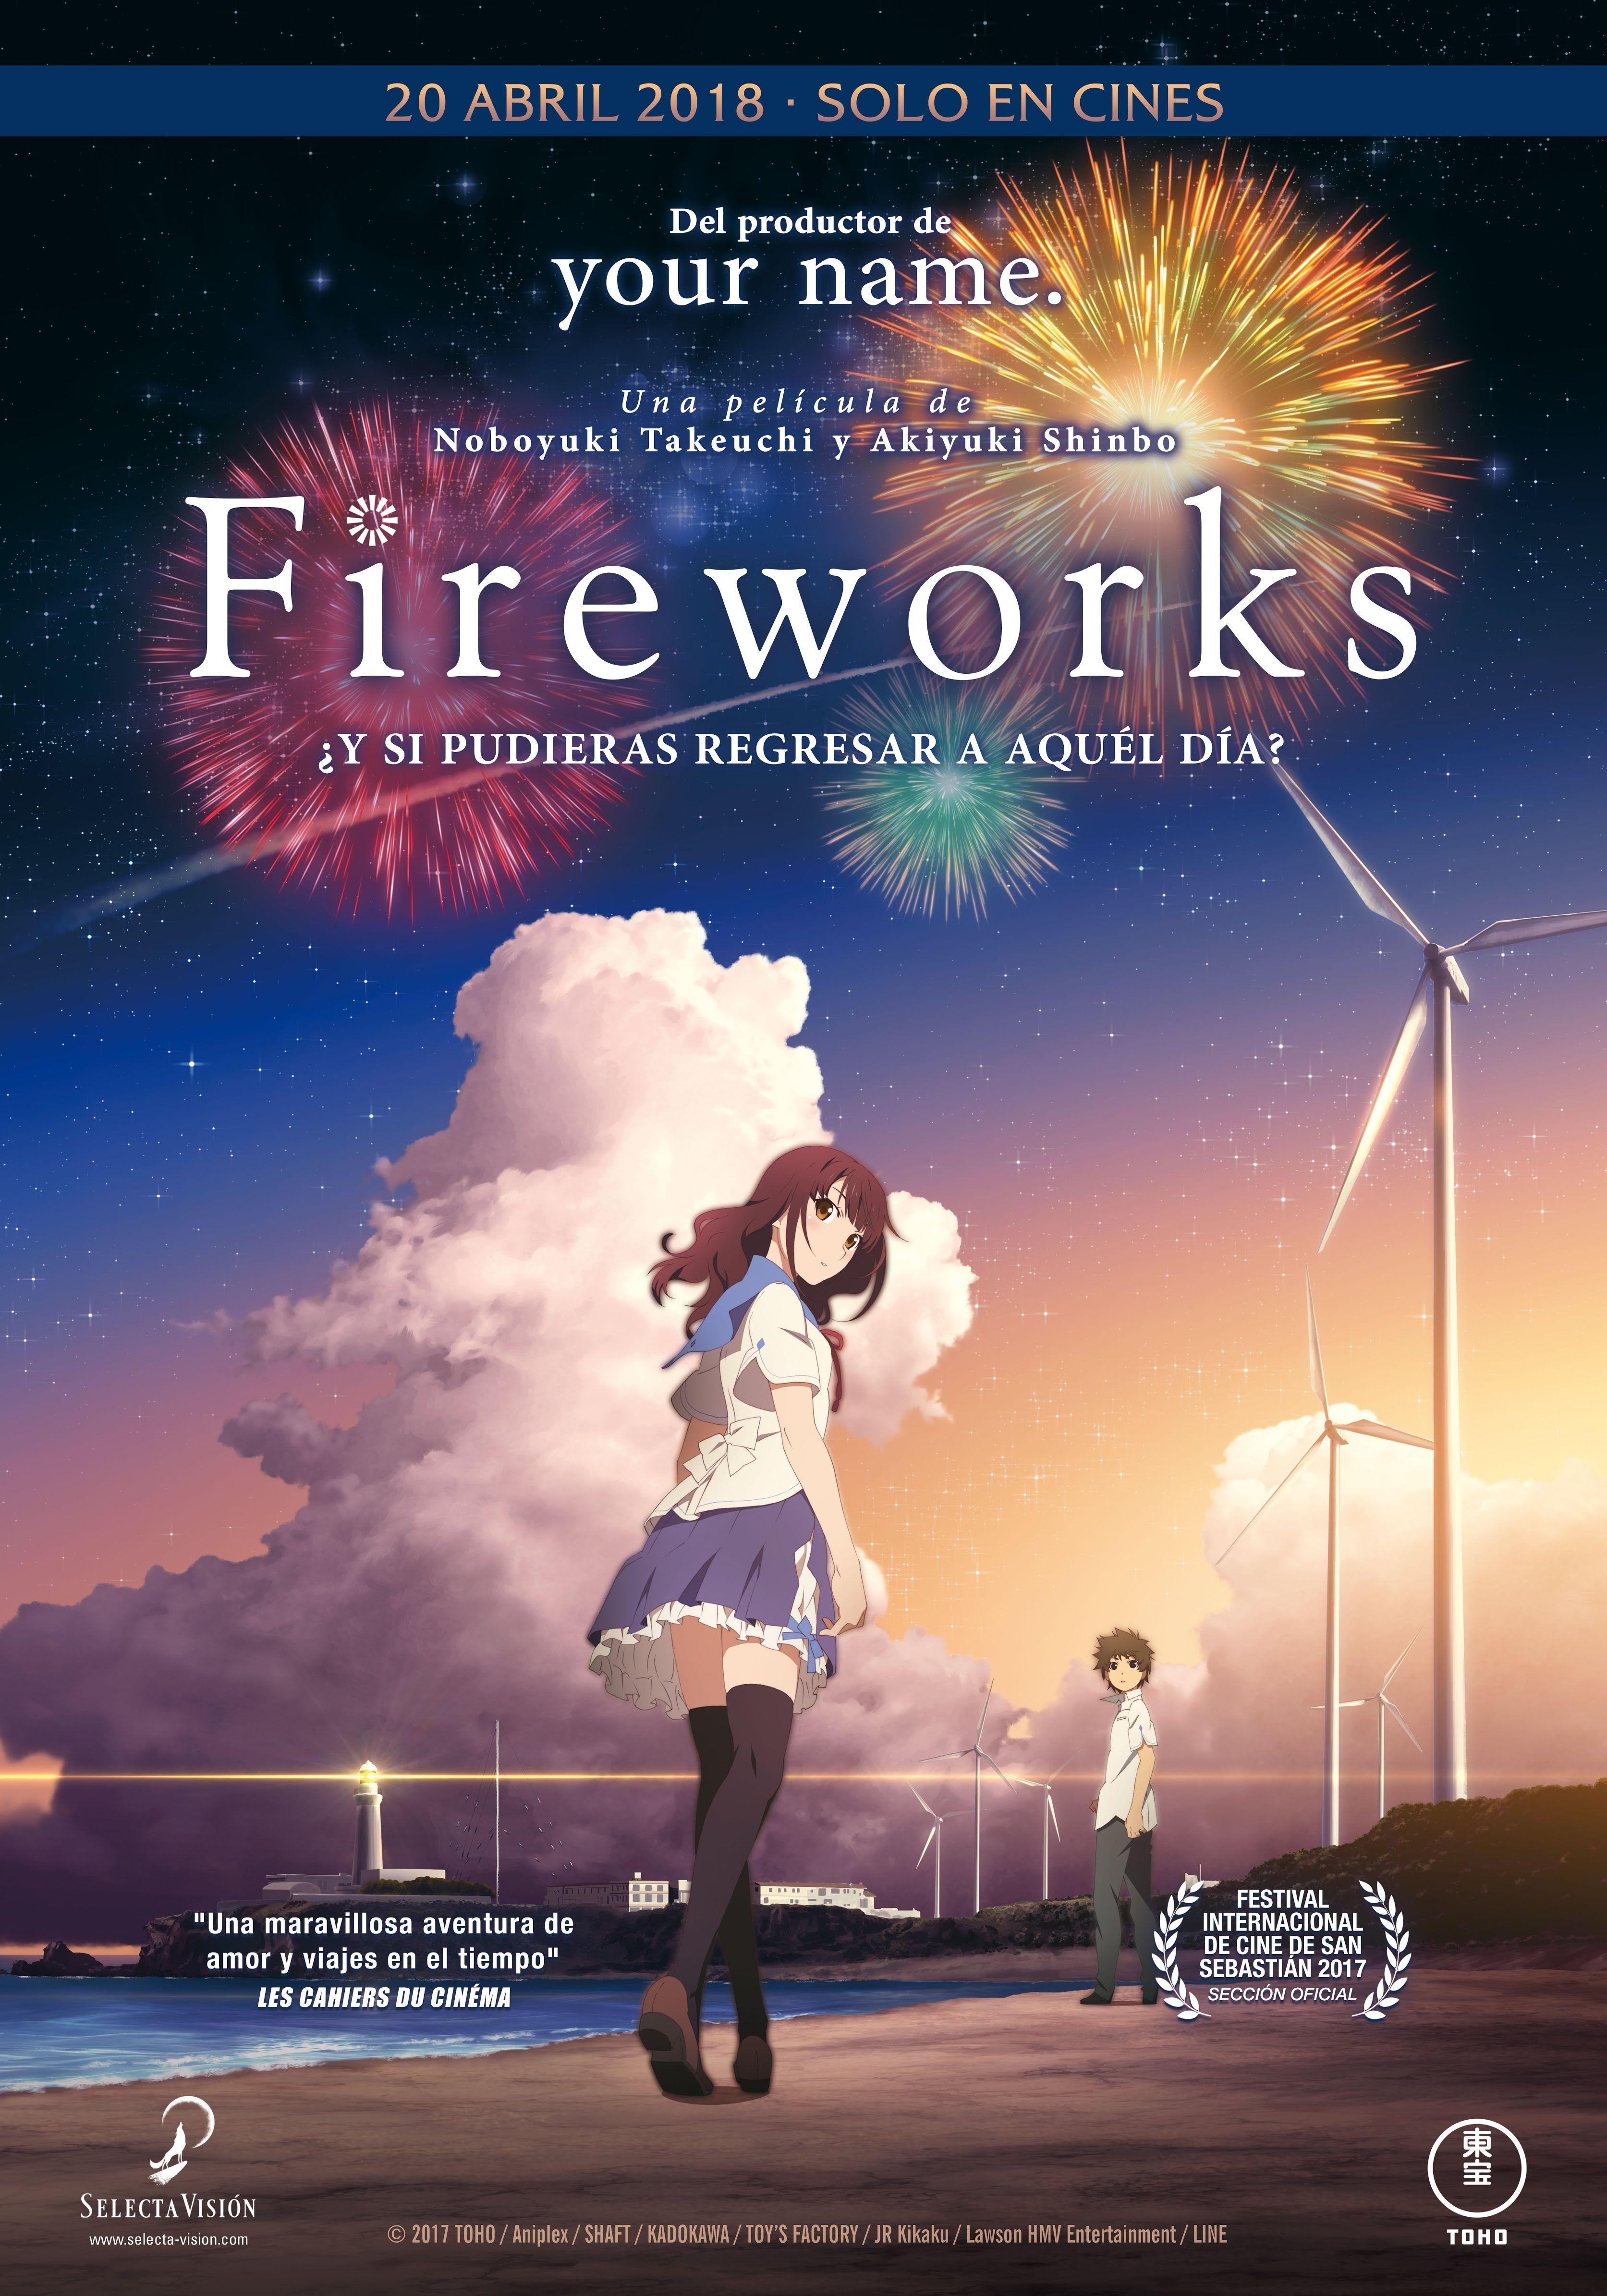 FireWorks Películas de anime, Peliculas japonesas anime